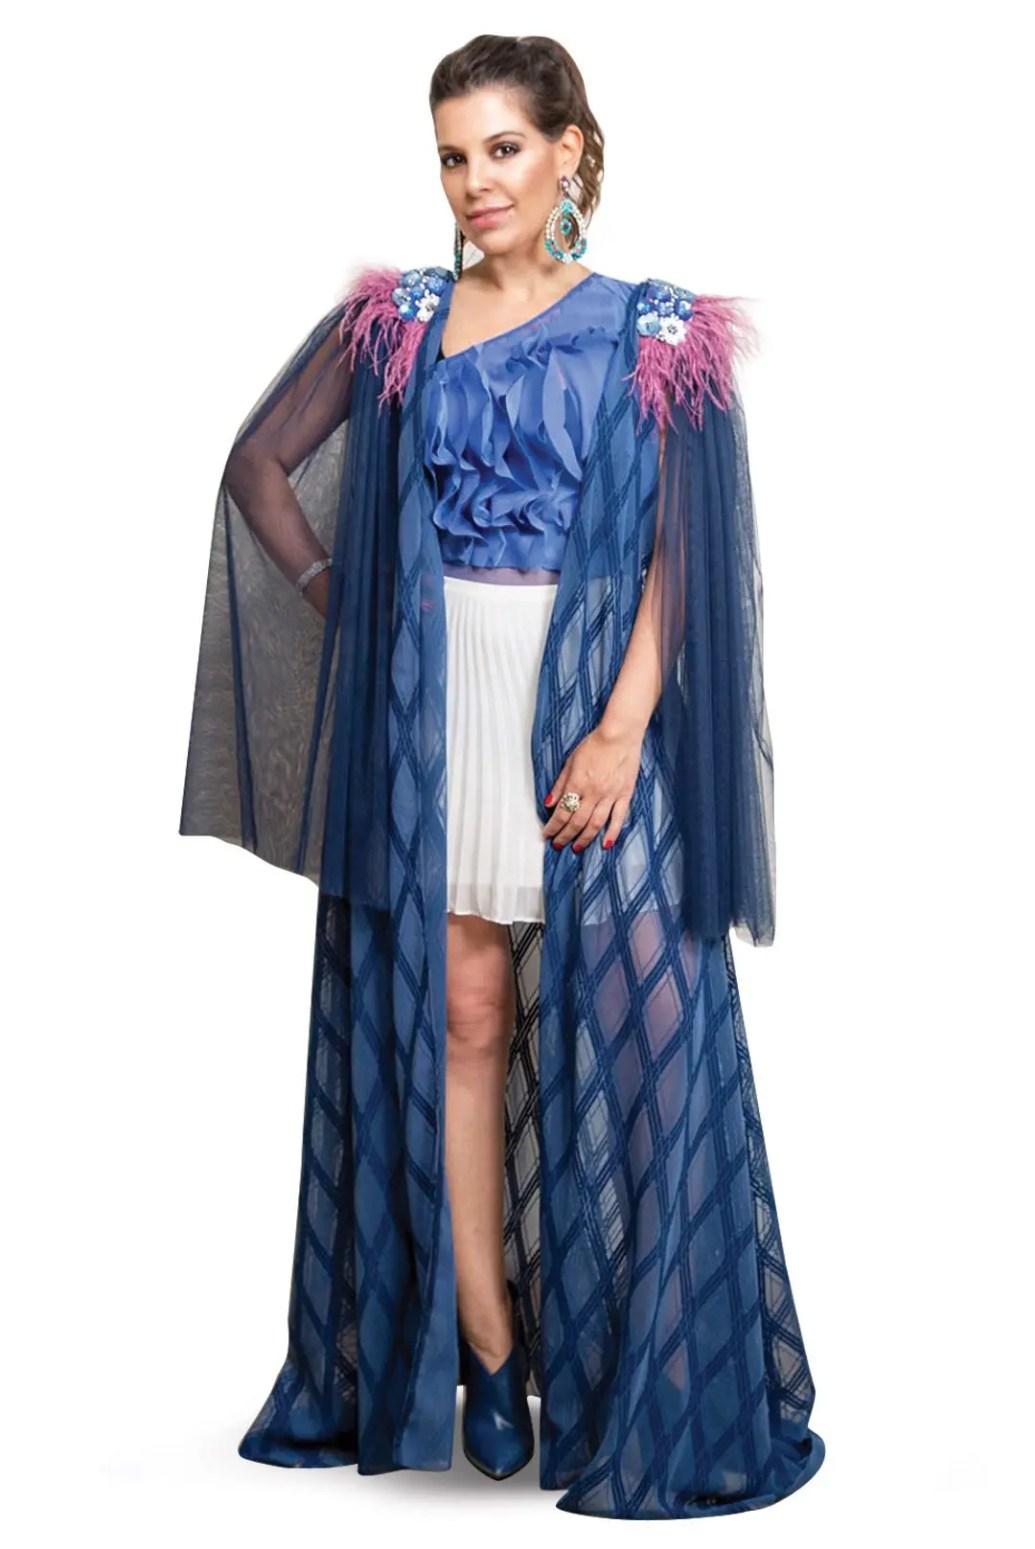 d74715a08437c عباية الريش (The Dreamy Feather Abaya) – متجر خود للأزياء – أناقة ...